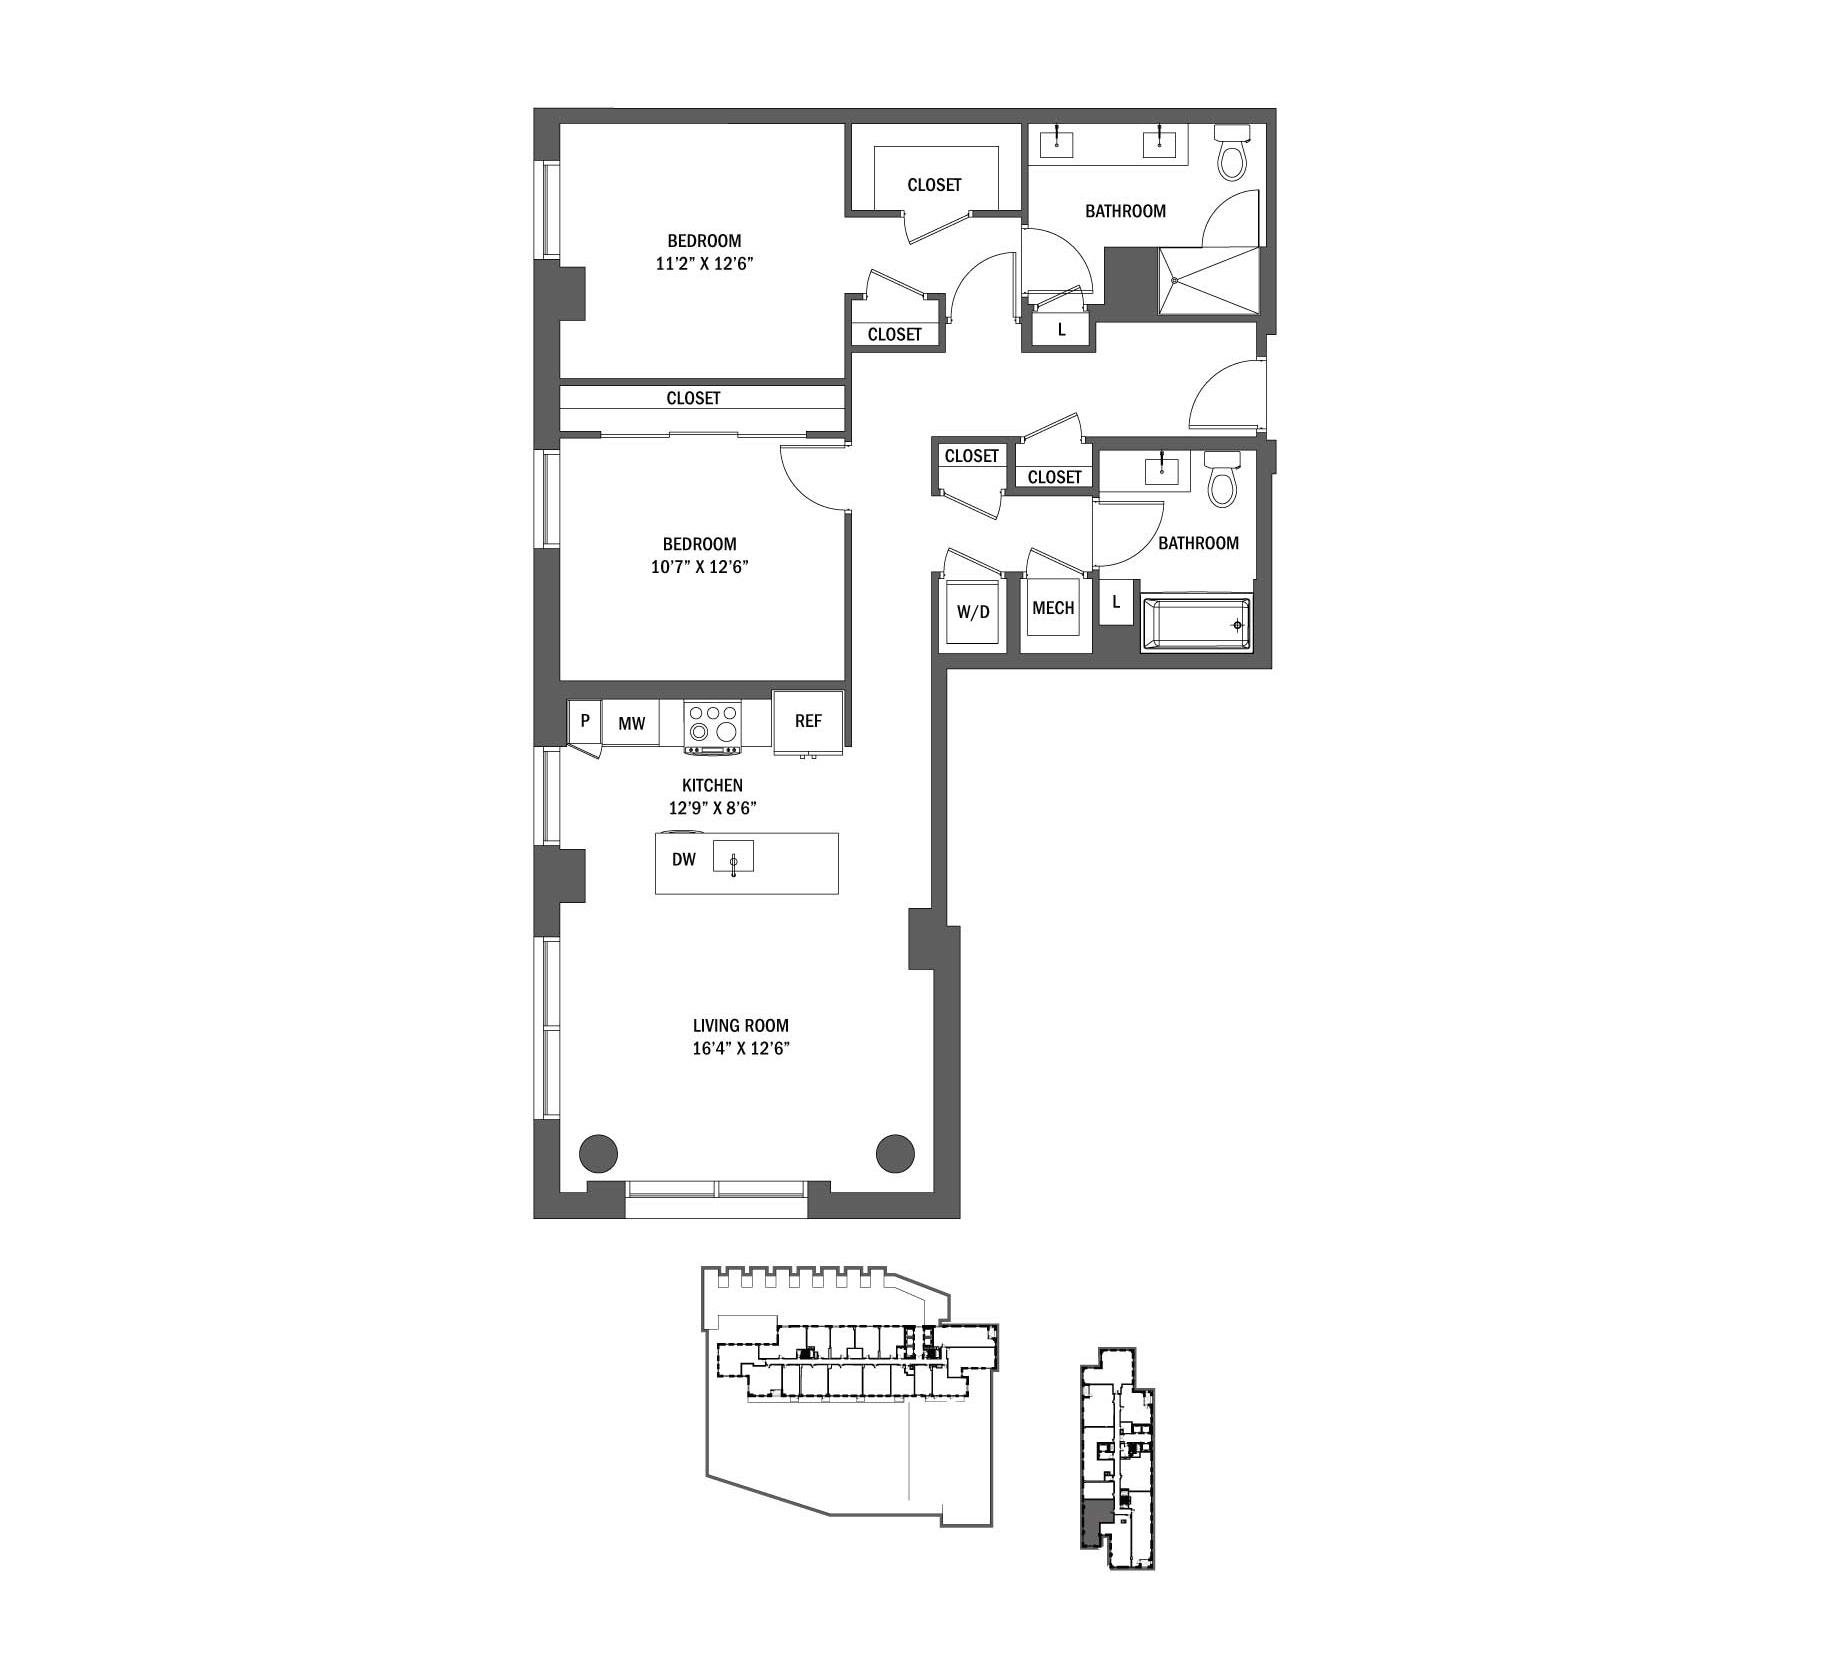 P0625338 789bc08 e08 18p 2 floorplan